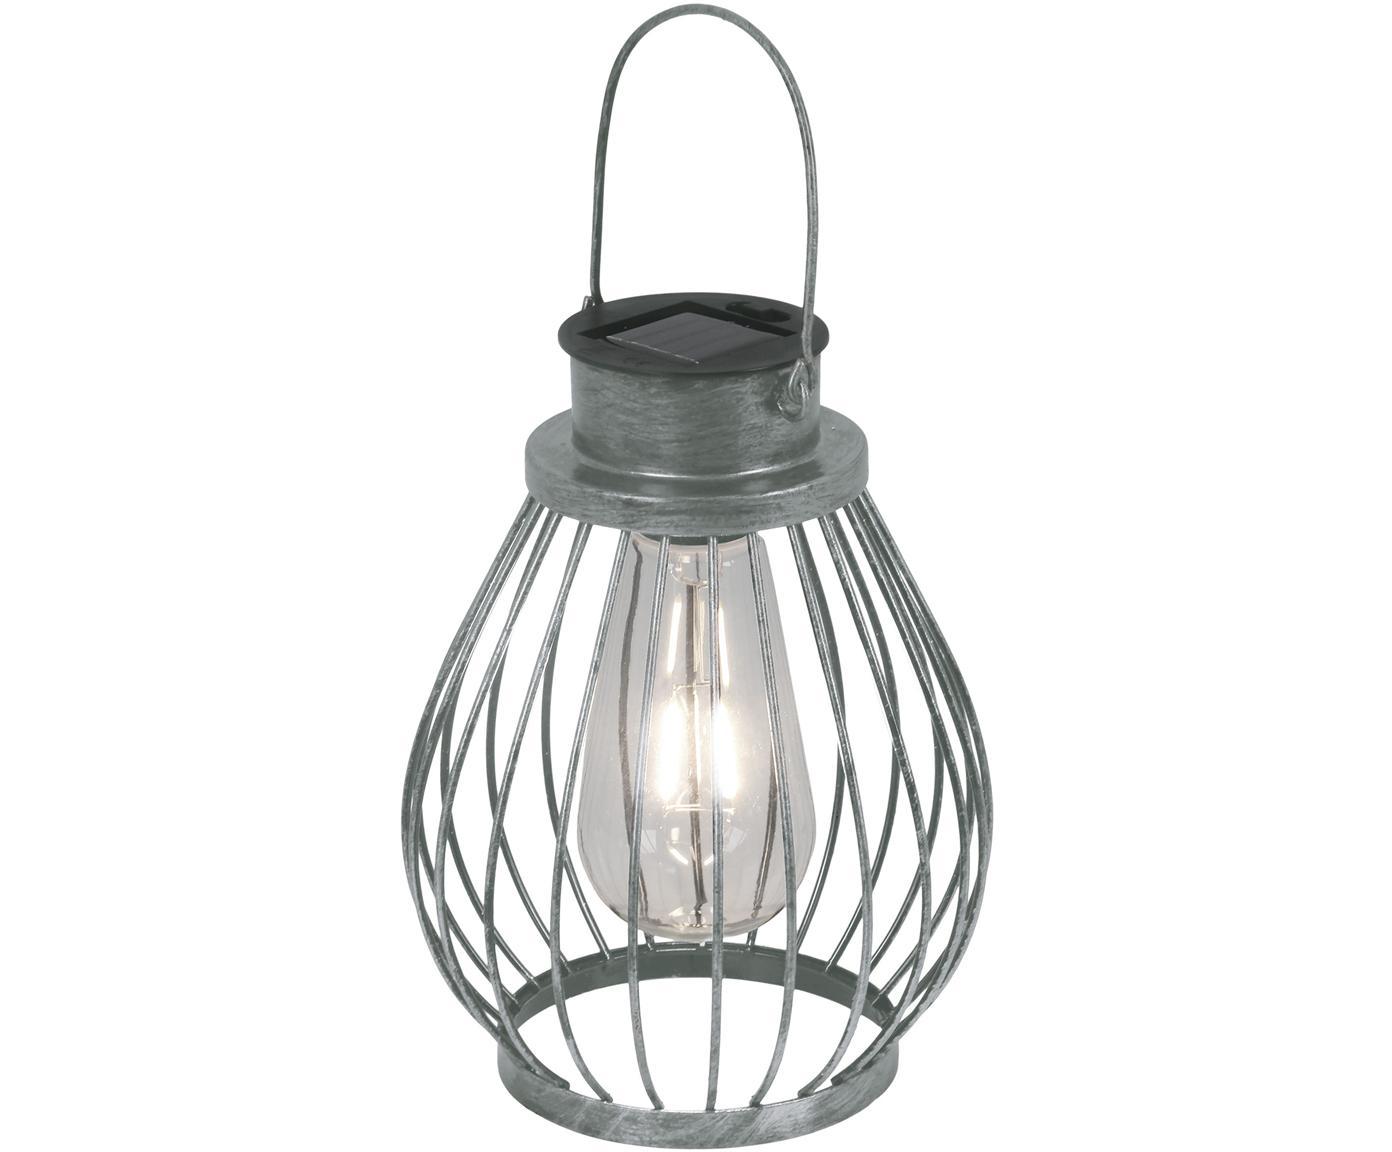 LED Solarleuchte Grid, Gestell: Metall, Lampenschirm: Glas, Metall, Ø 16 x H 30 cm